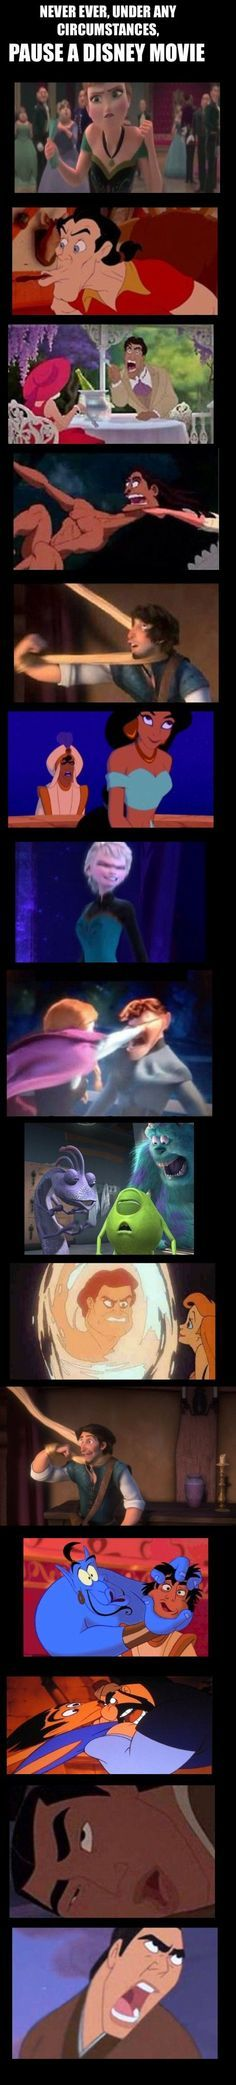 ALWAYS, under every circumstances, pause a Disney movie.: